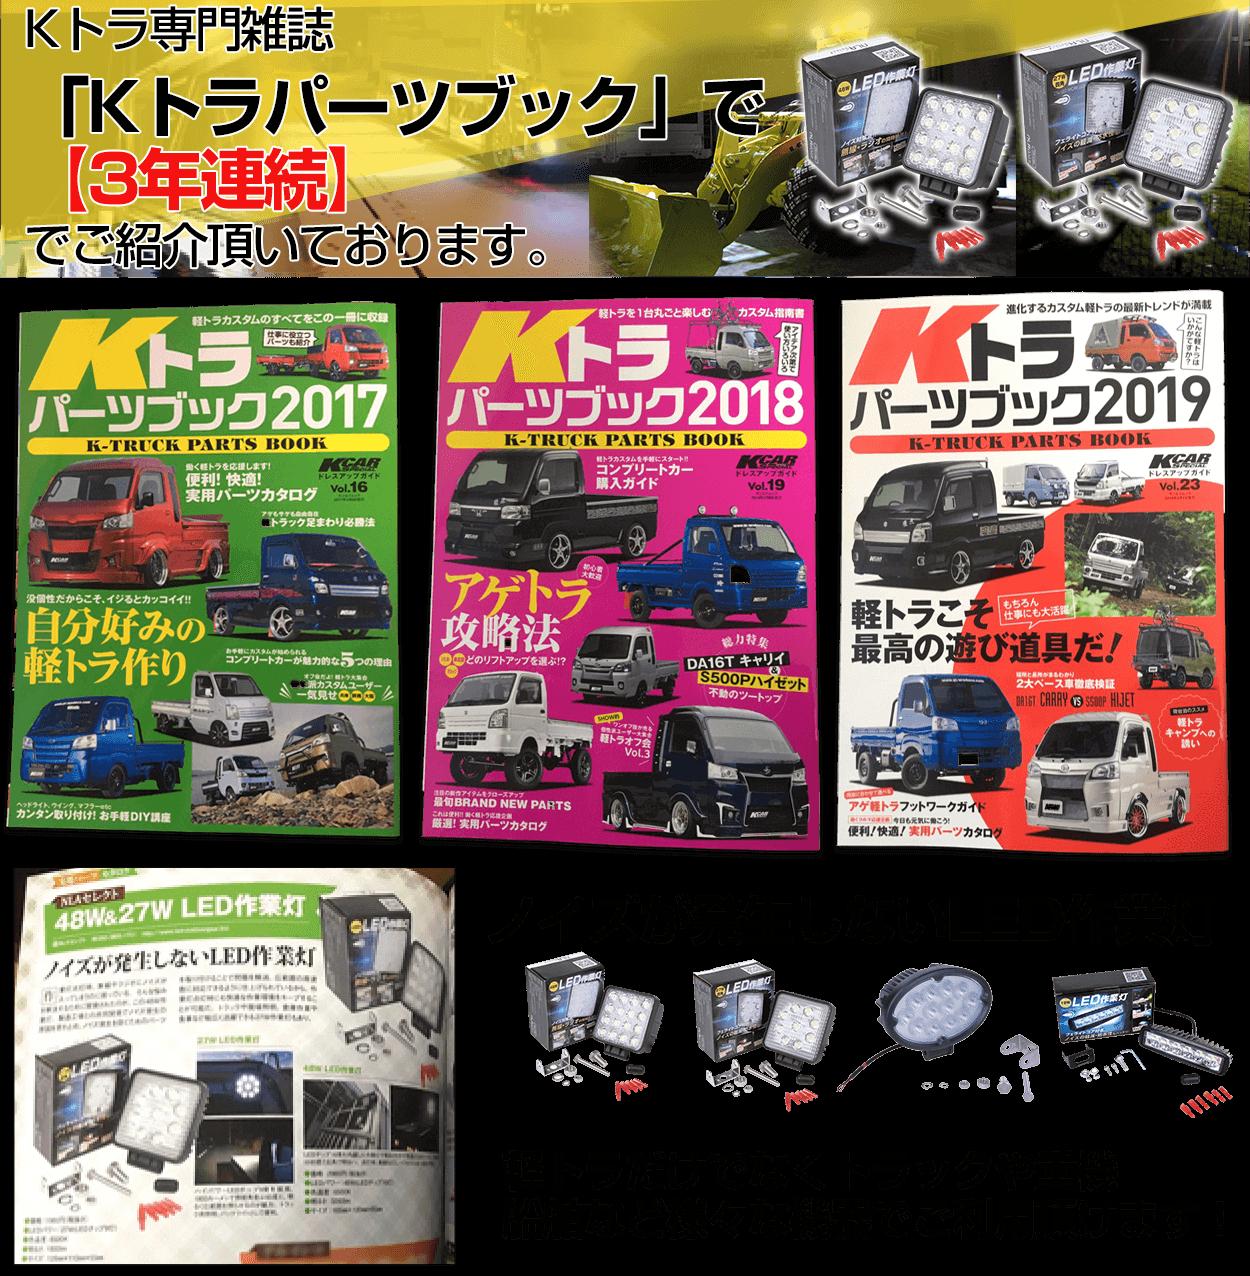 LED作業灯48W 雑誌掲載記録の紹介